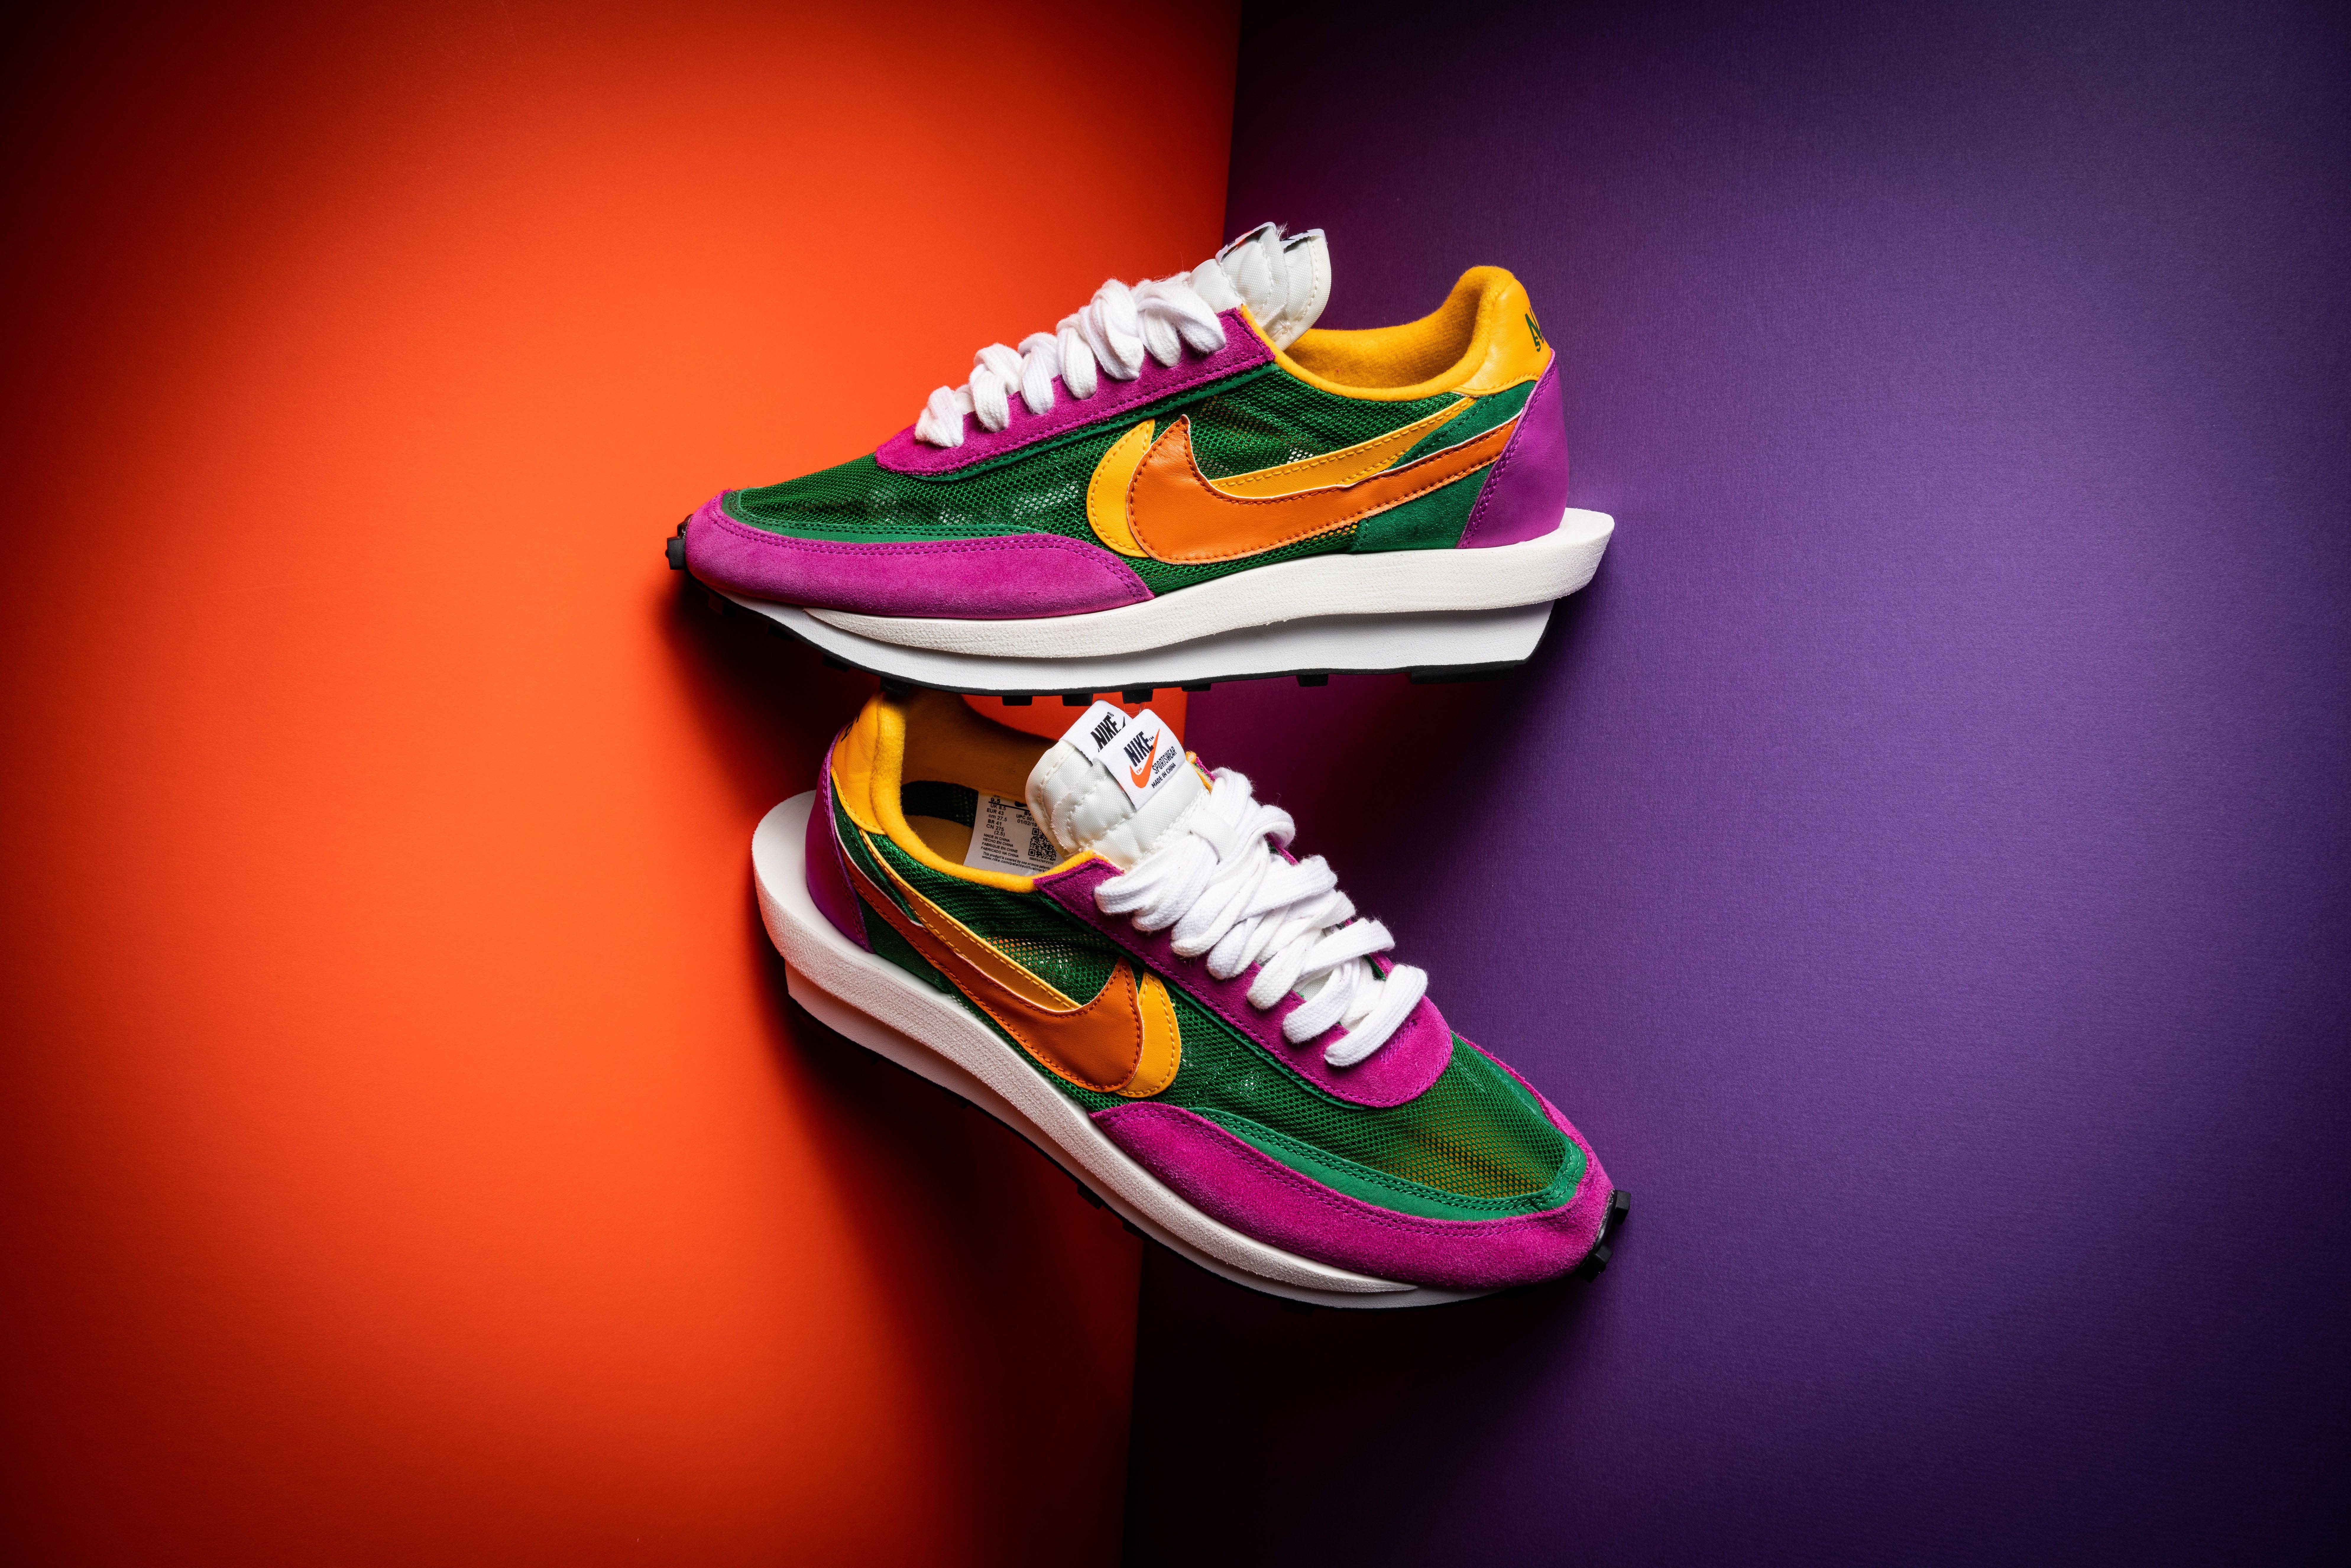 Nike Ldwaffle Sacai Pine Green Bv0073 301 2021 In 2021 Sneakers Nike Perfect Sneakers